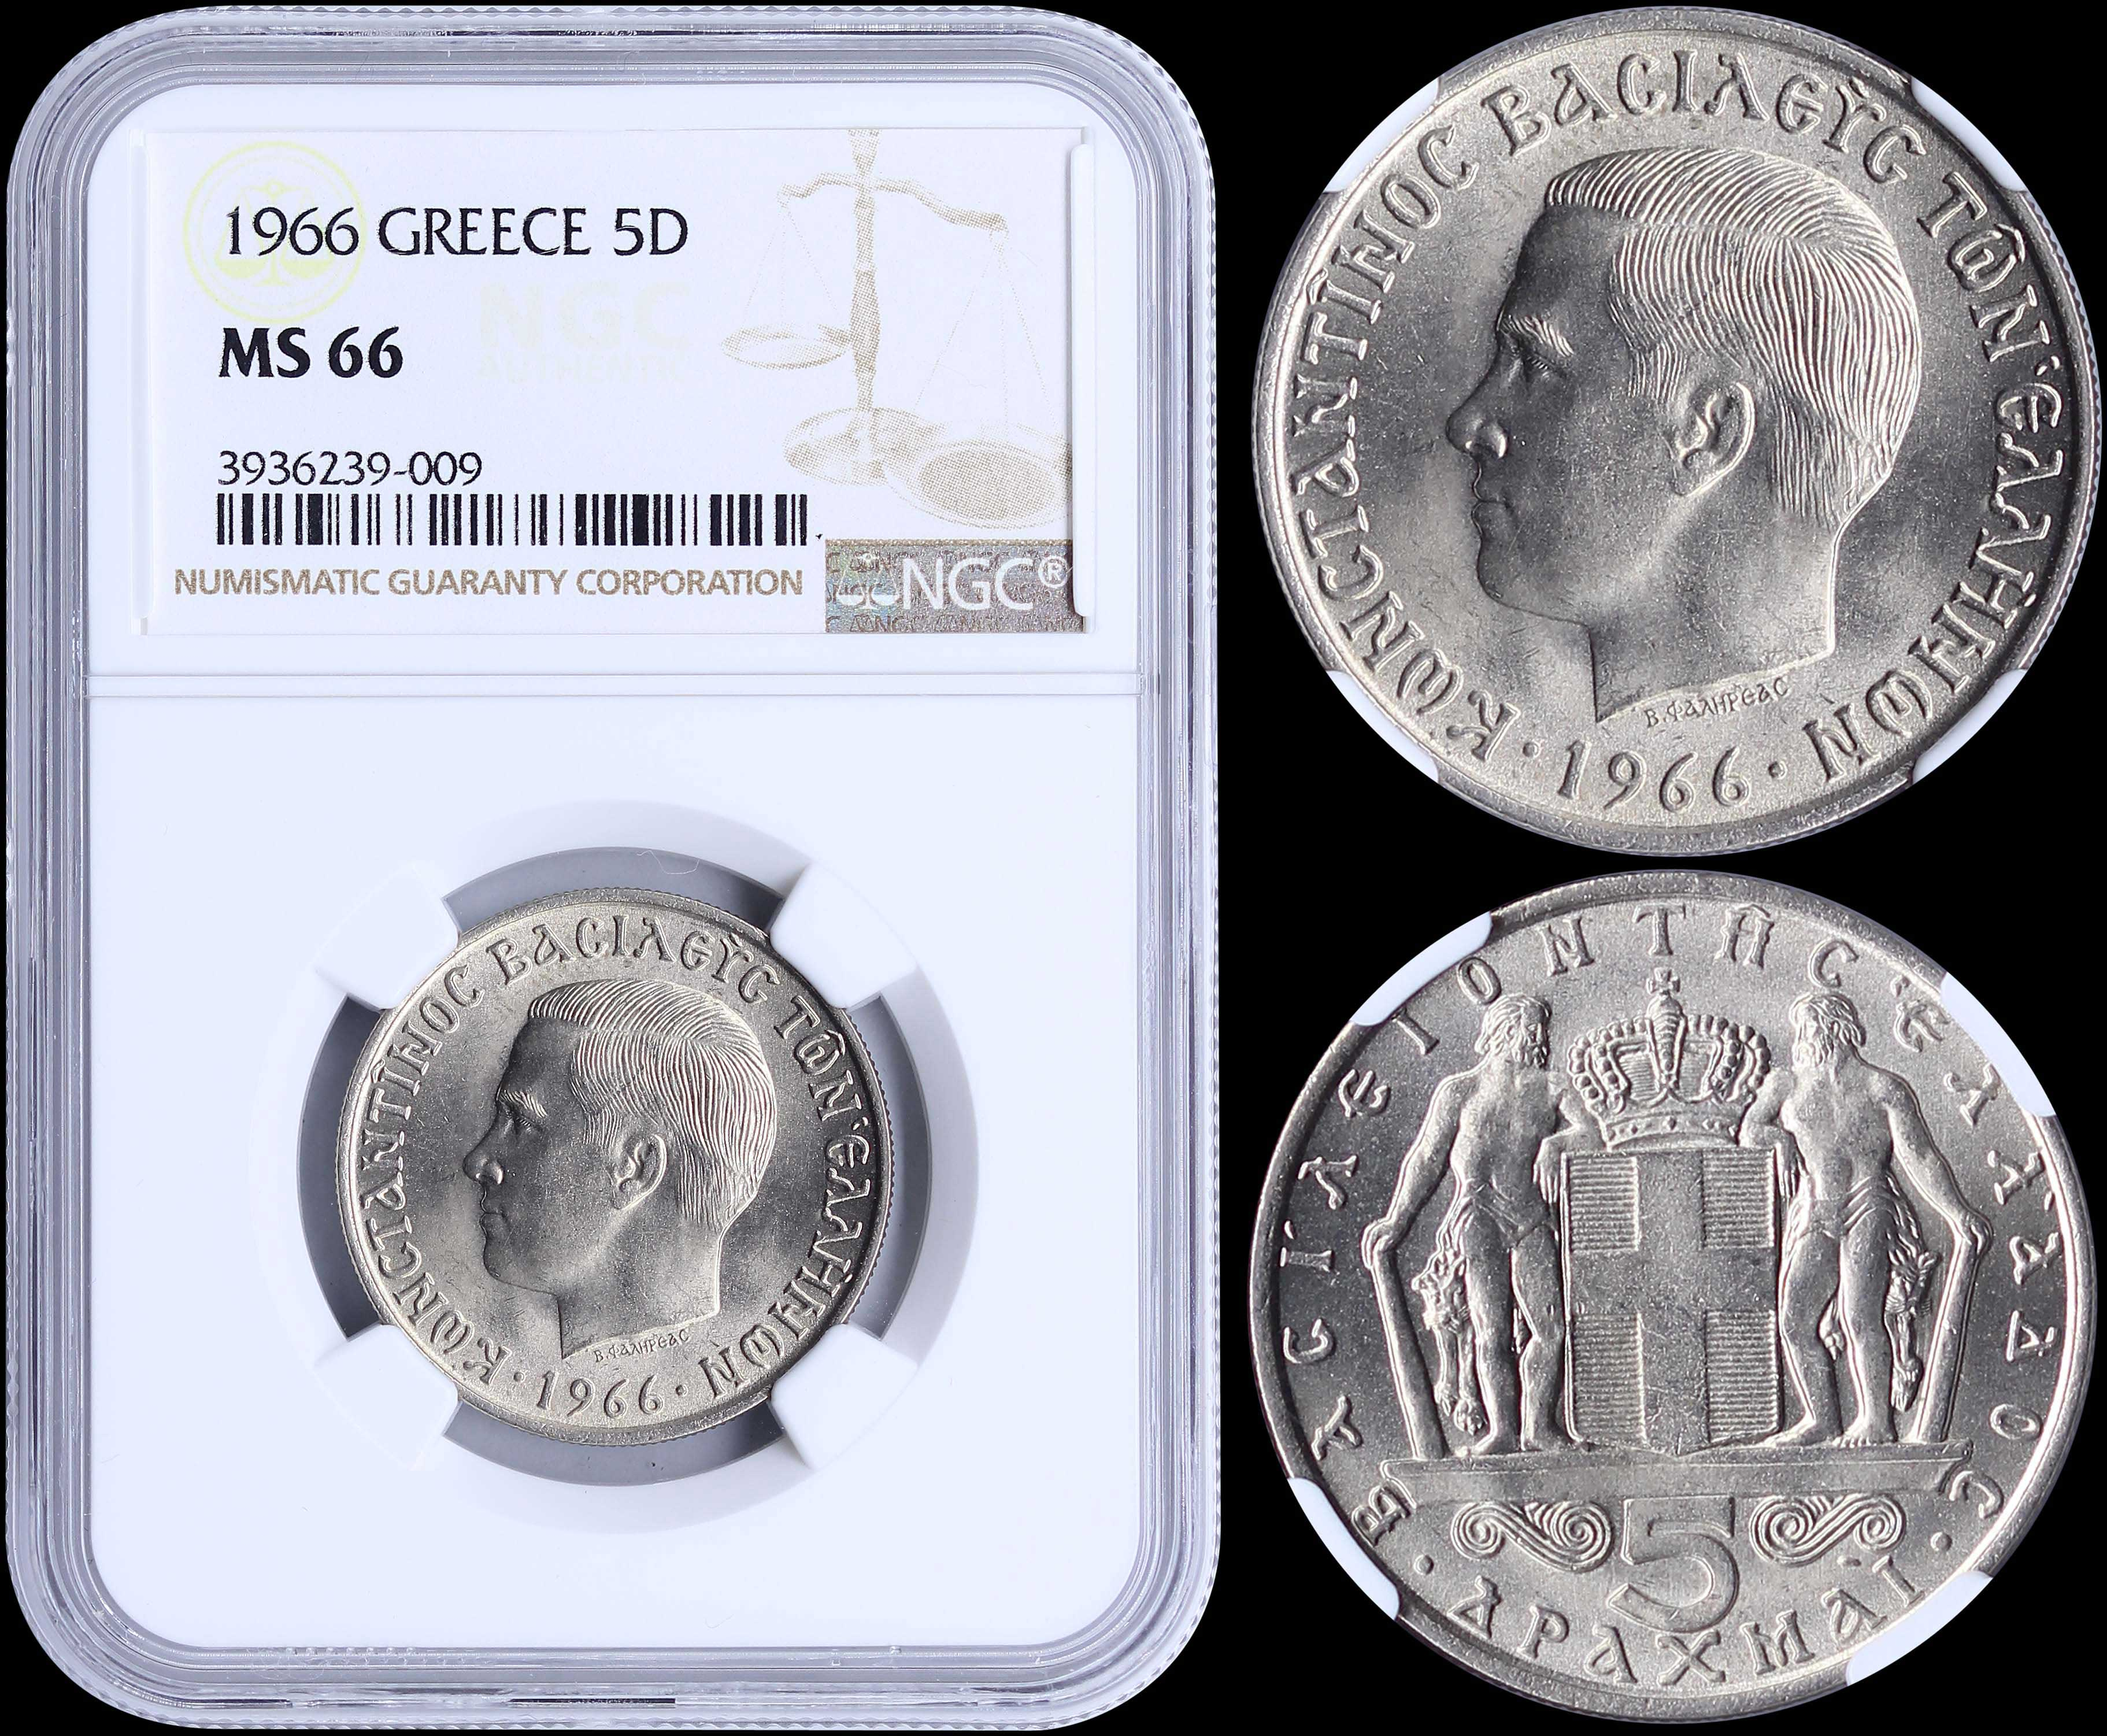 Lot 8210 - -  COINS & TOKENS king constantine ii -  A. Karamitsos Public & Live Bid Auction 644 Coins, Medals & Banknotes